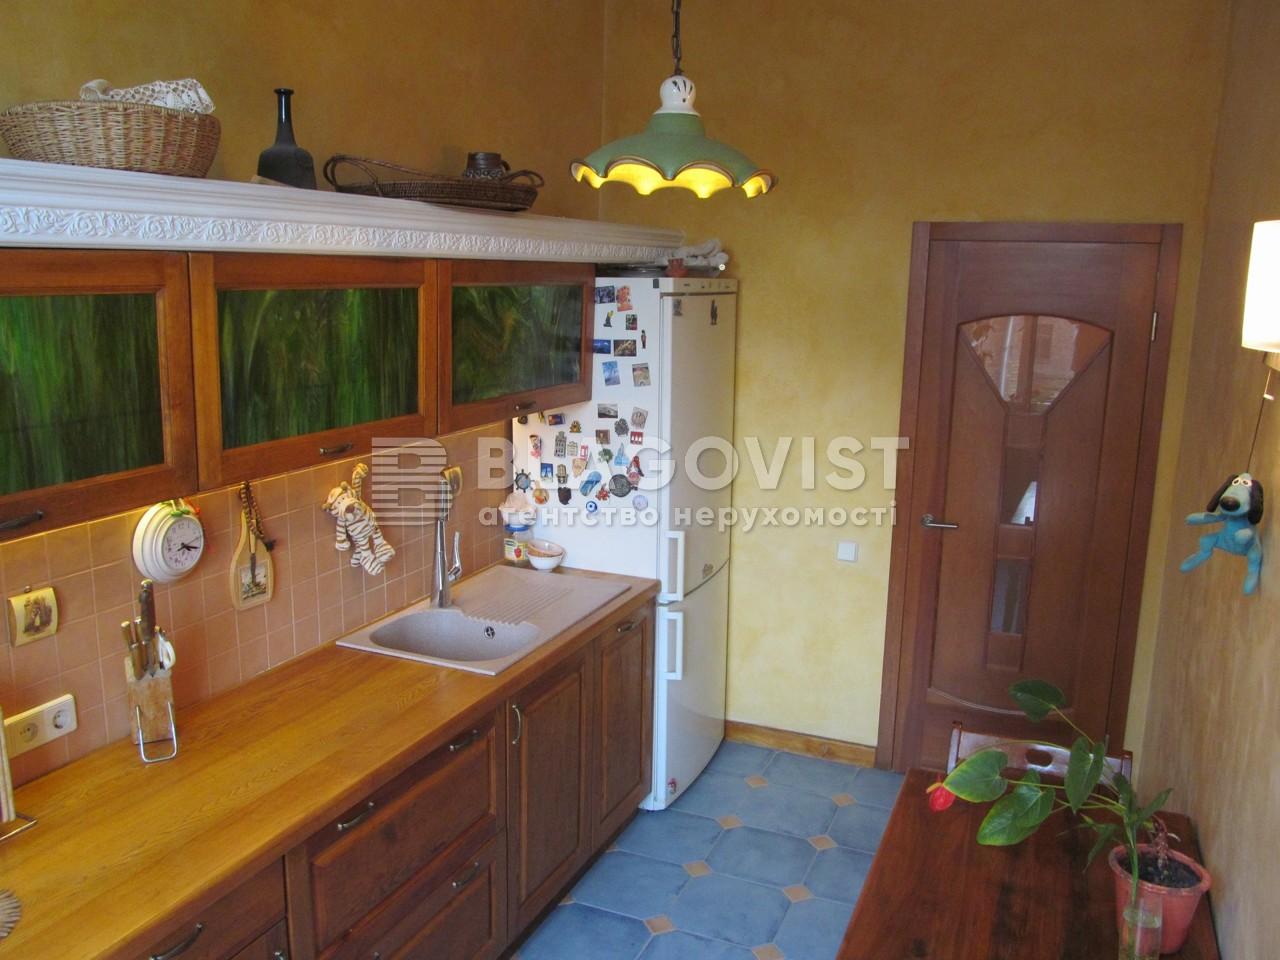 Квартира C-103021, Деловая (Димитрова), 13, Киев - Фото 9